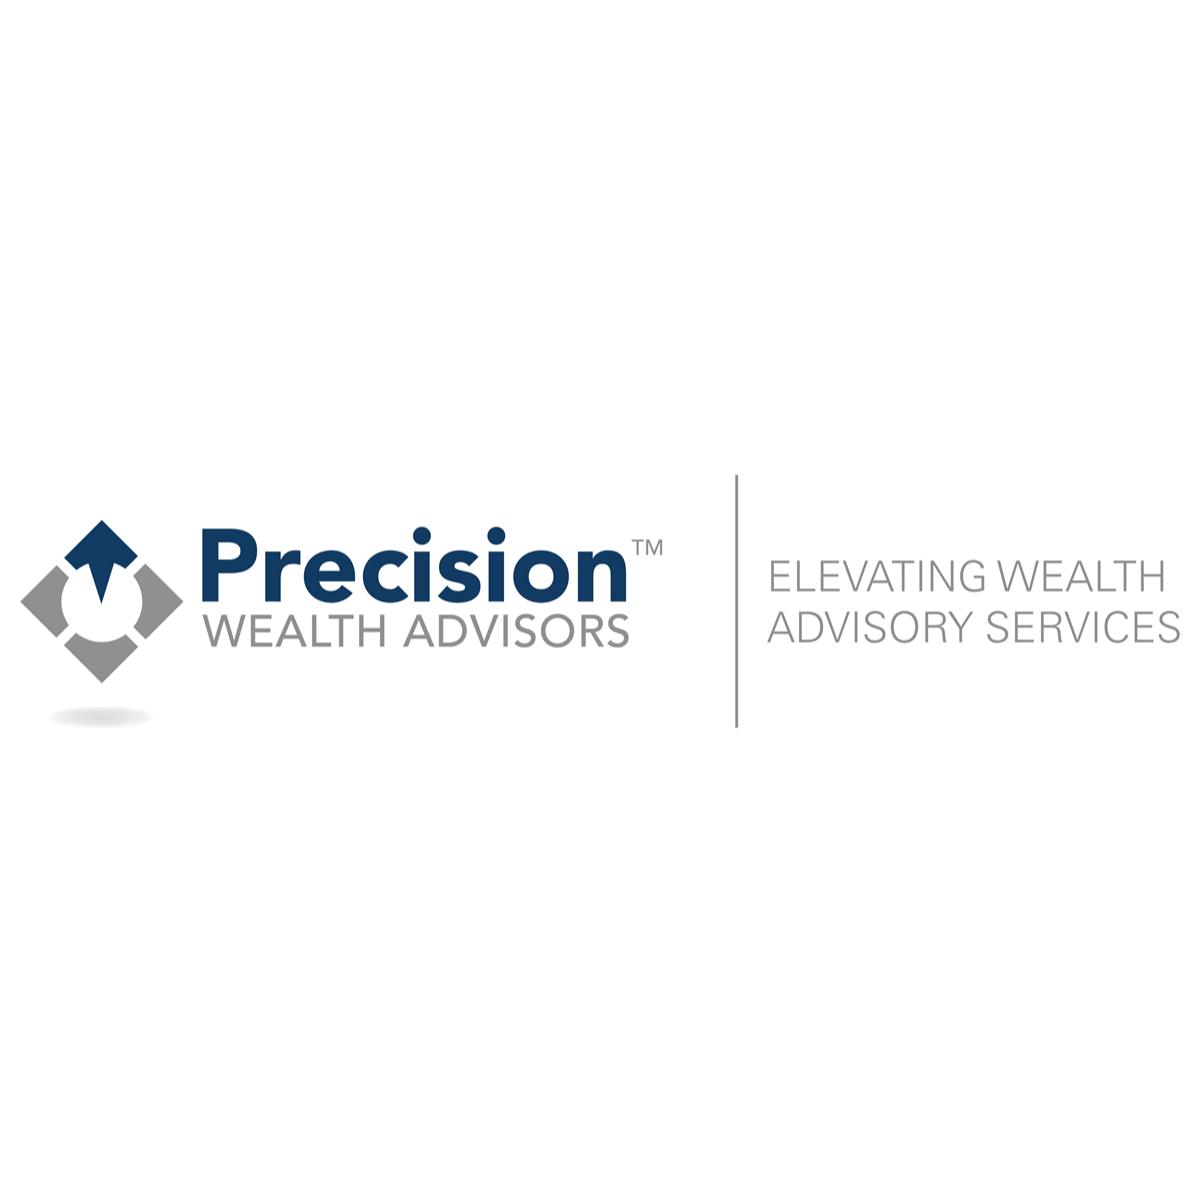 Precision Wealth Advisors